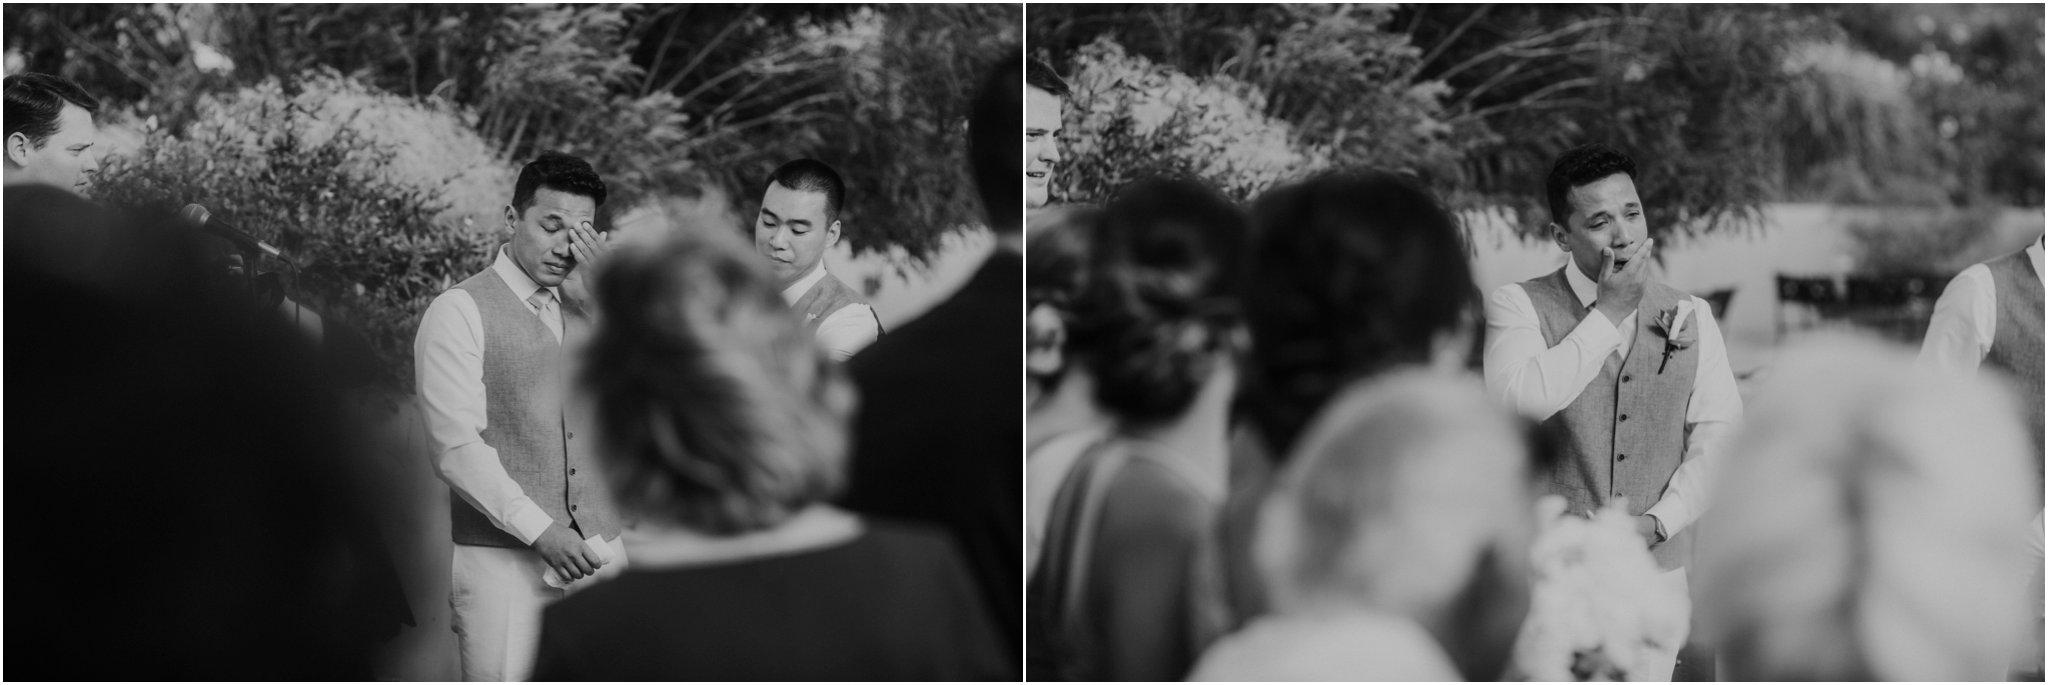 0026La Fonda Weddings Blue Rose Photography Studios